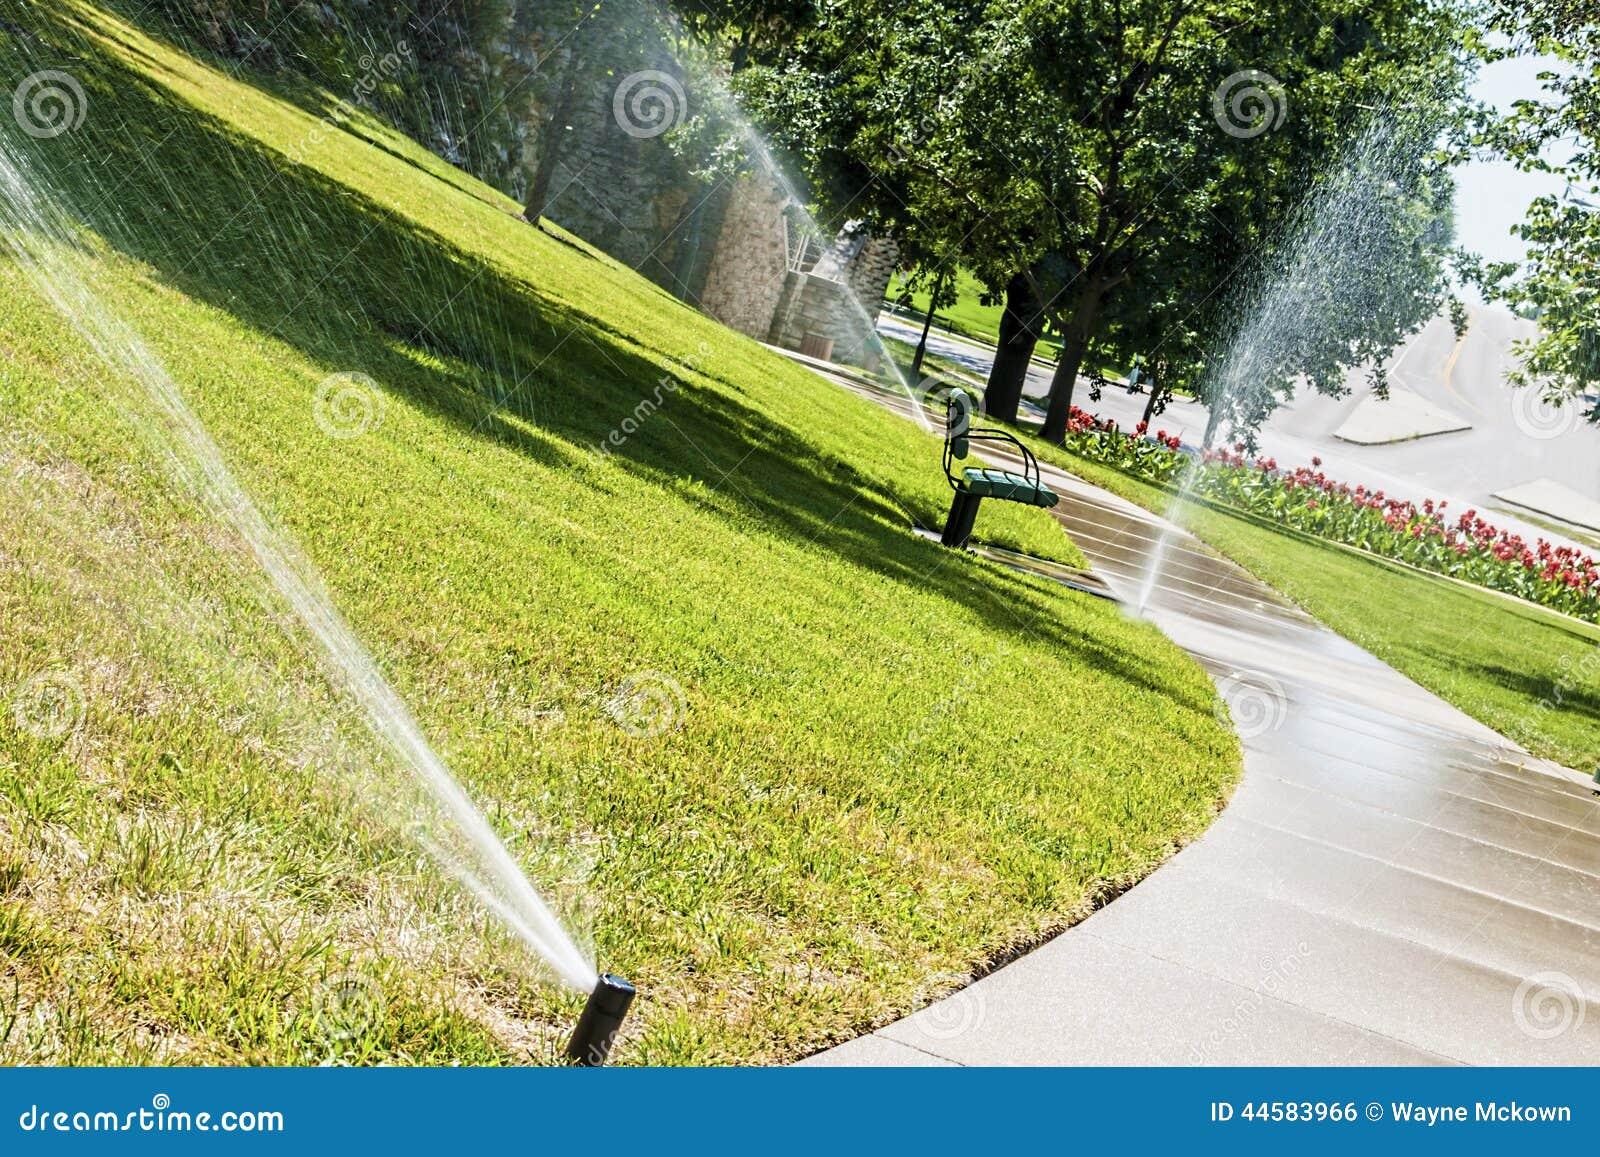 Grass Watering Stock Photo Image 44583966